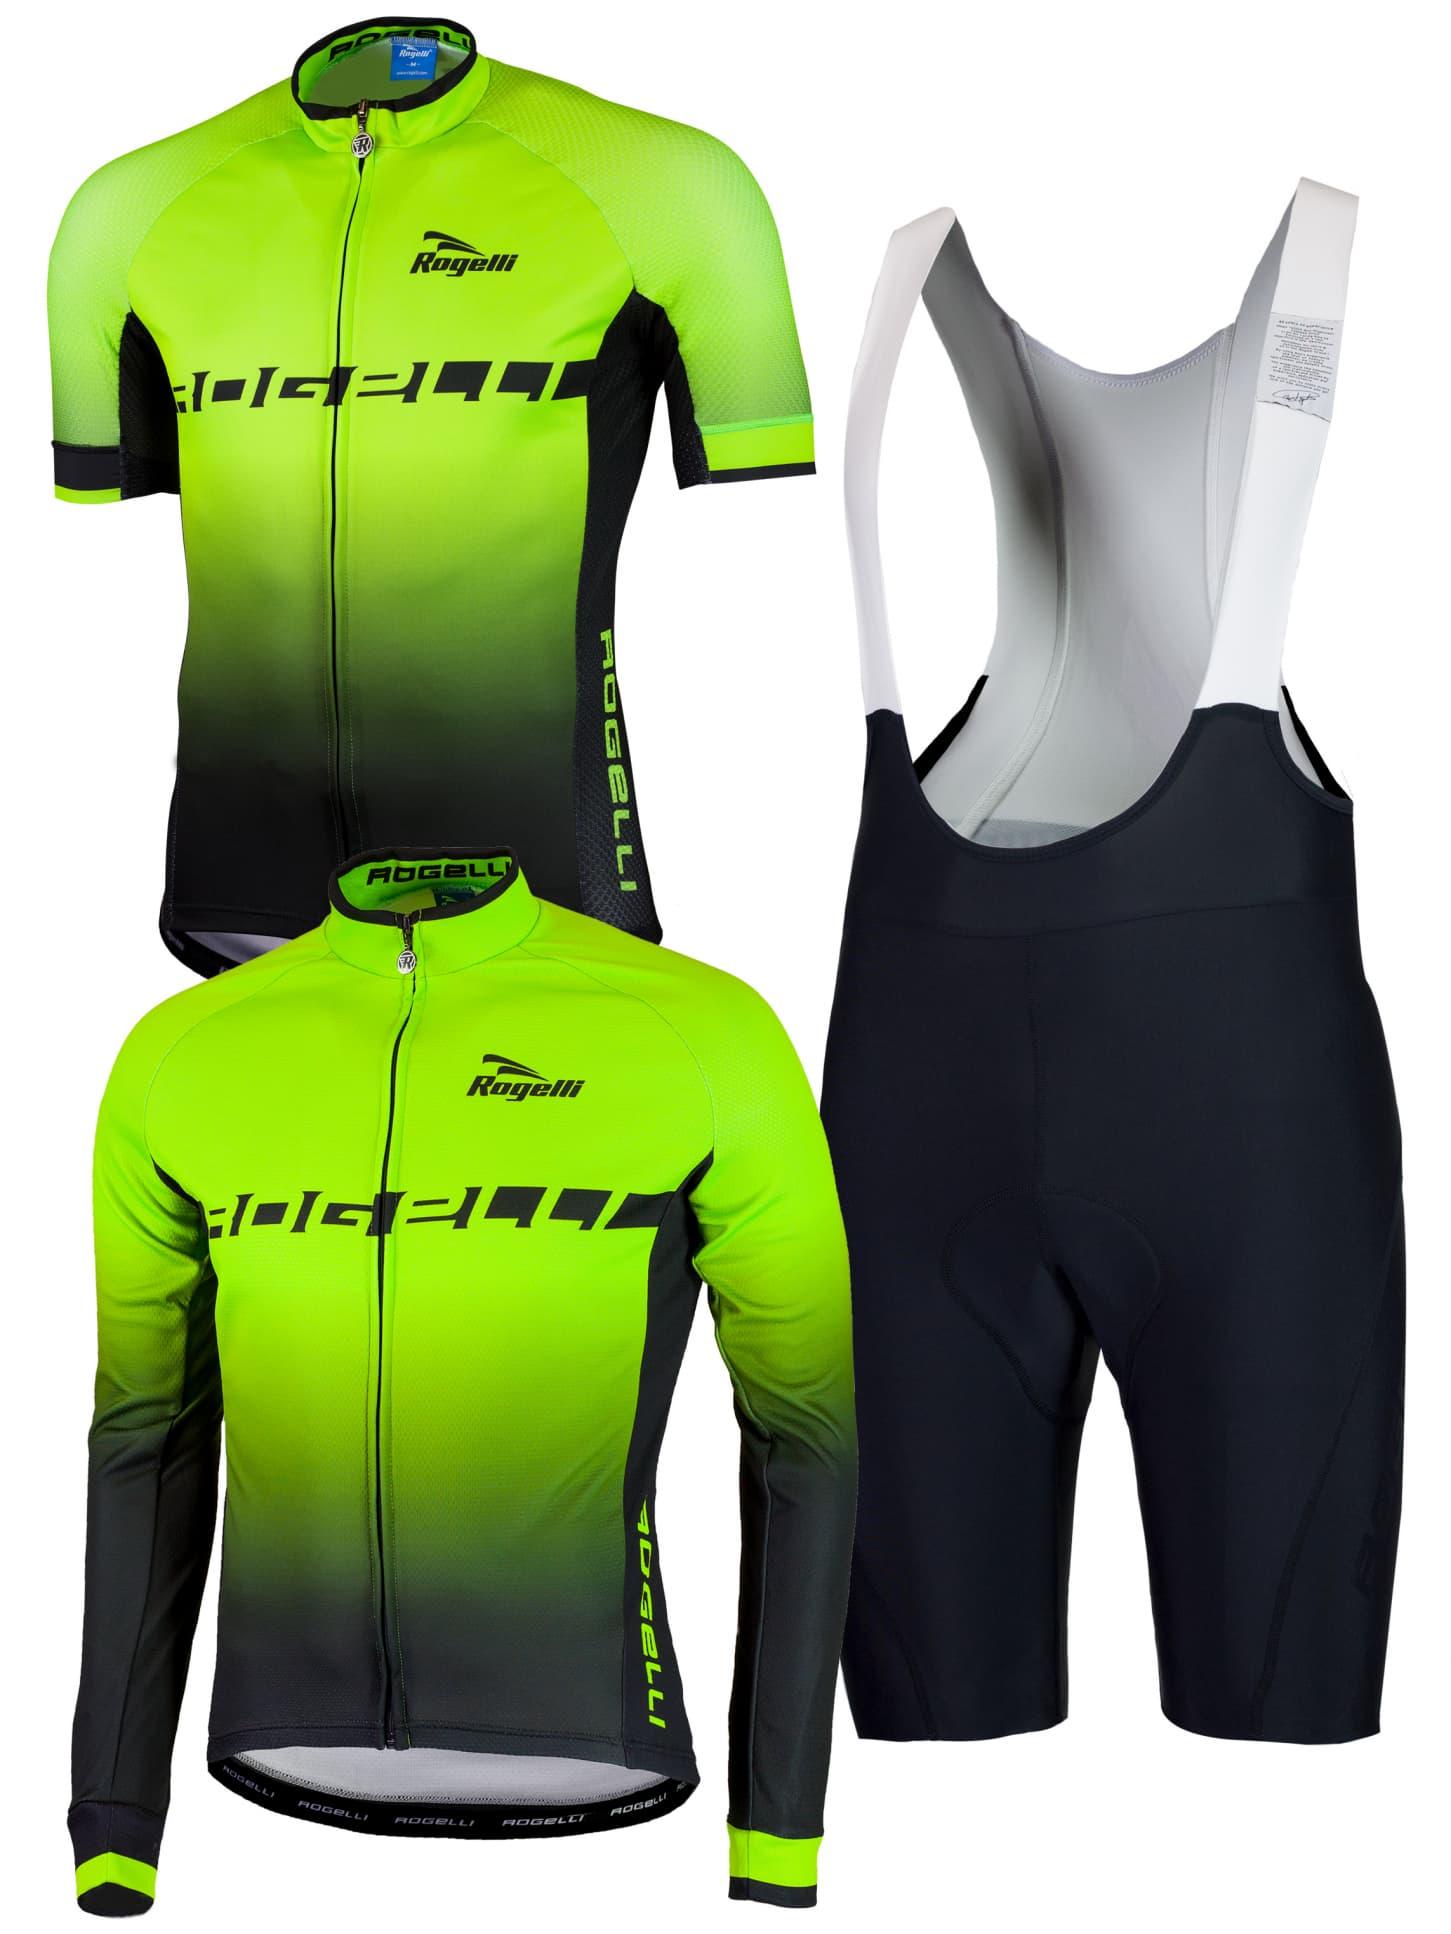 effadaacc85e8 Cyklo oblečenie Rogelli ISPIRATO, reflexná zelená   Rogelli.sk